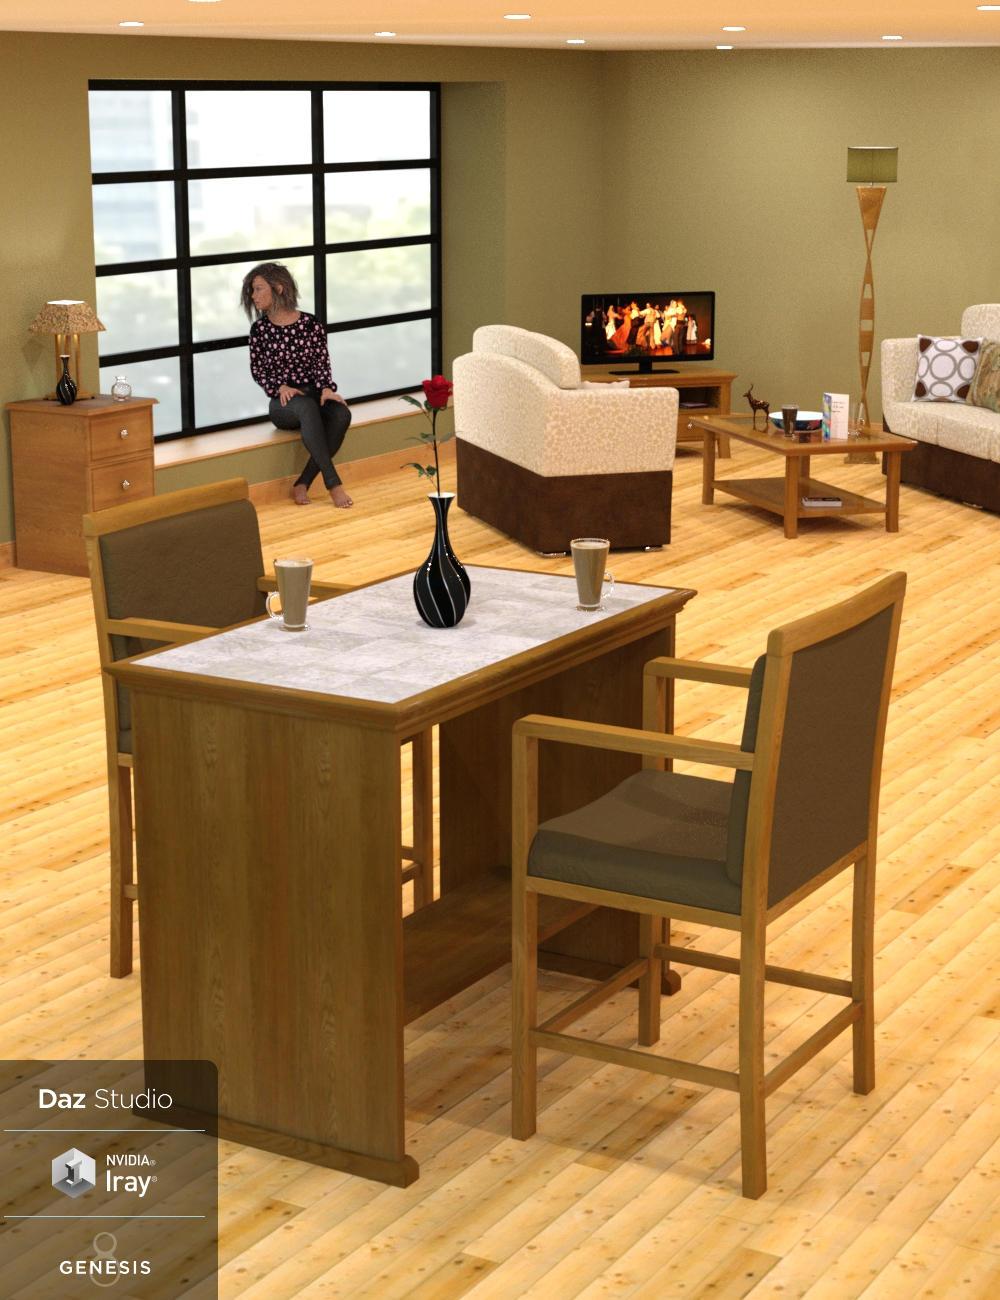 London Apartment - Lounge Area by: Wee Dangerous John, 3D Models by Daz 3D